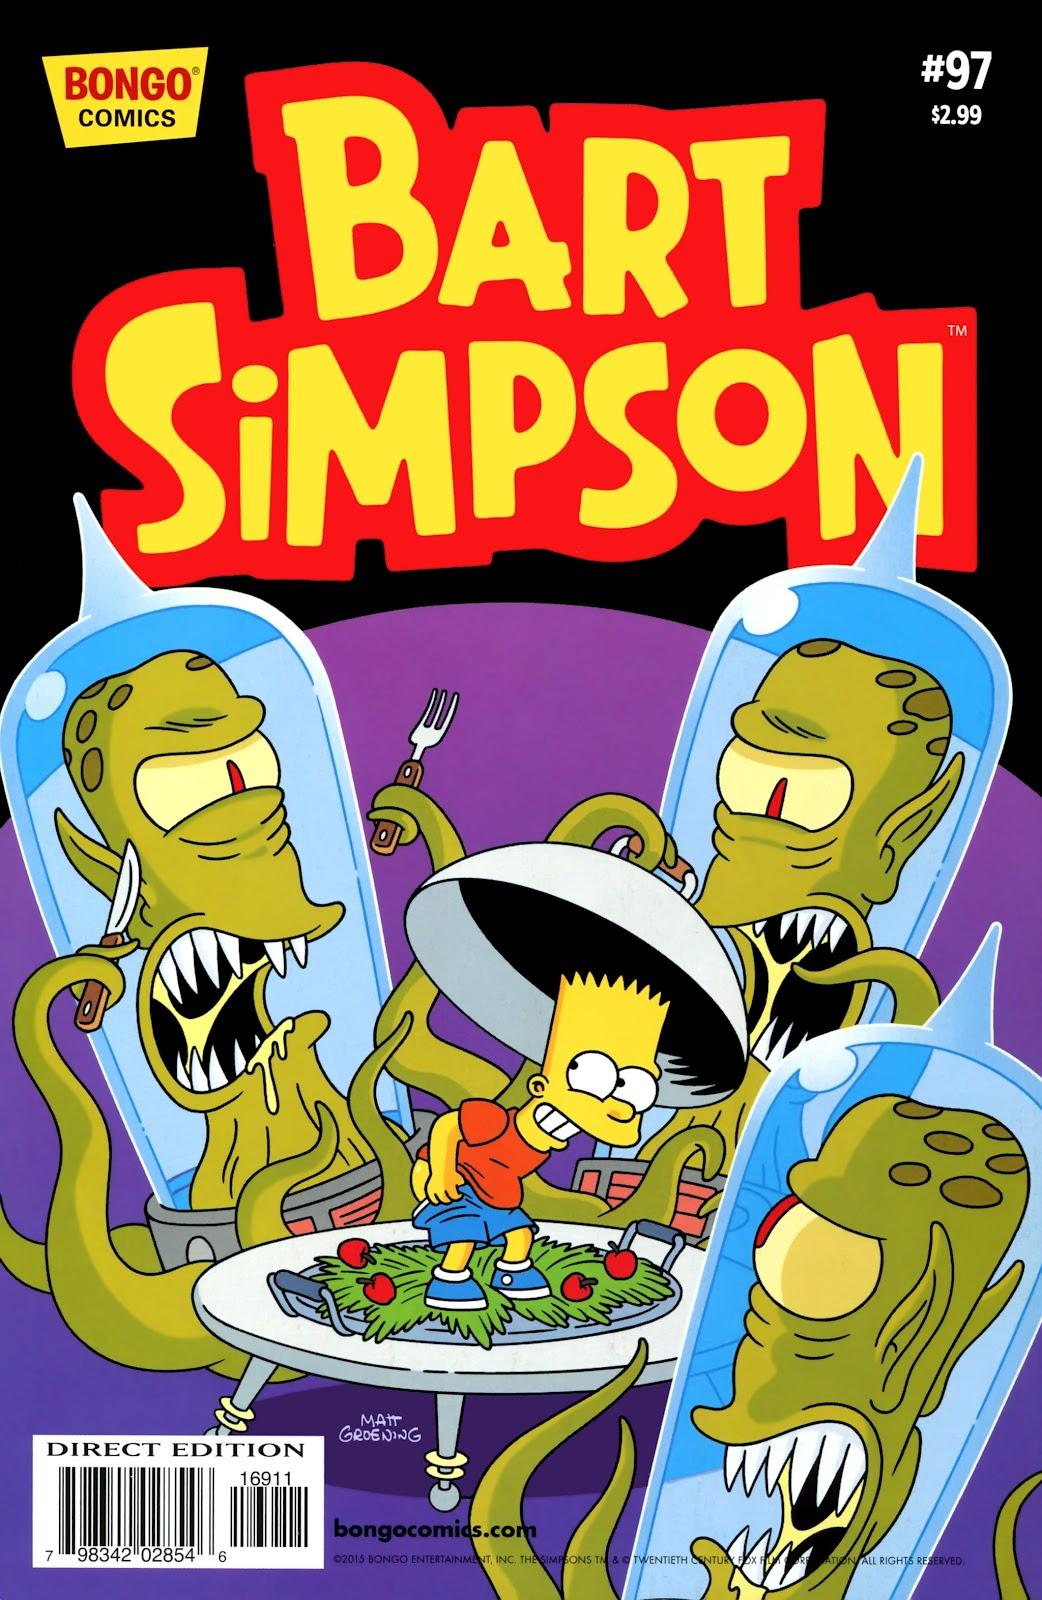 Simpsons Comics Presents Bart Simpson 97 Page 1